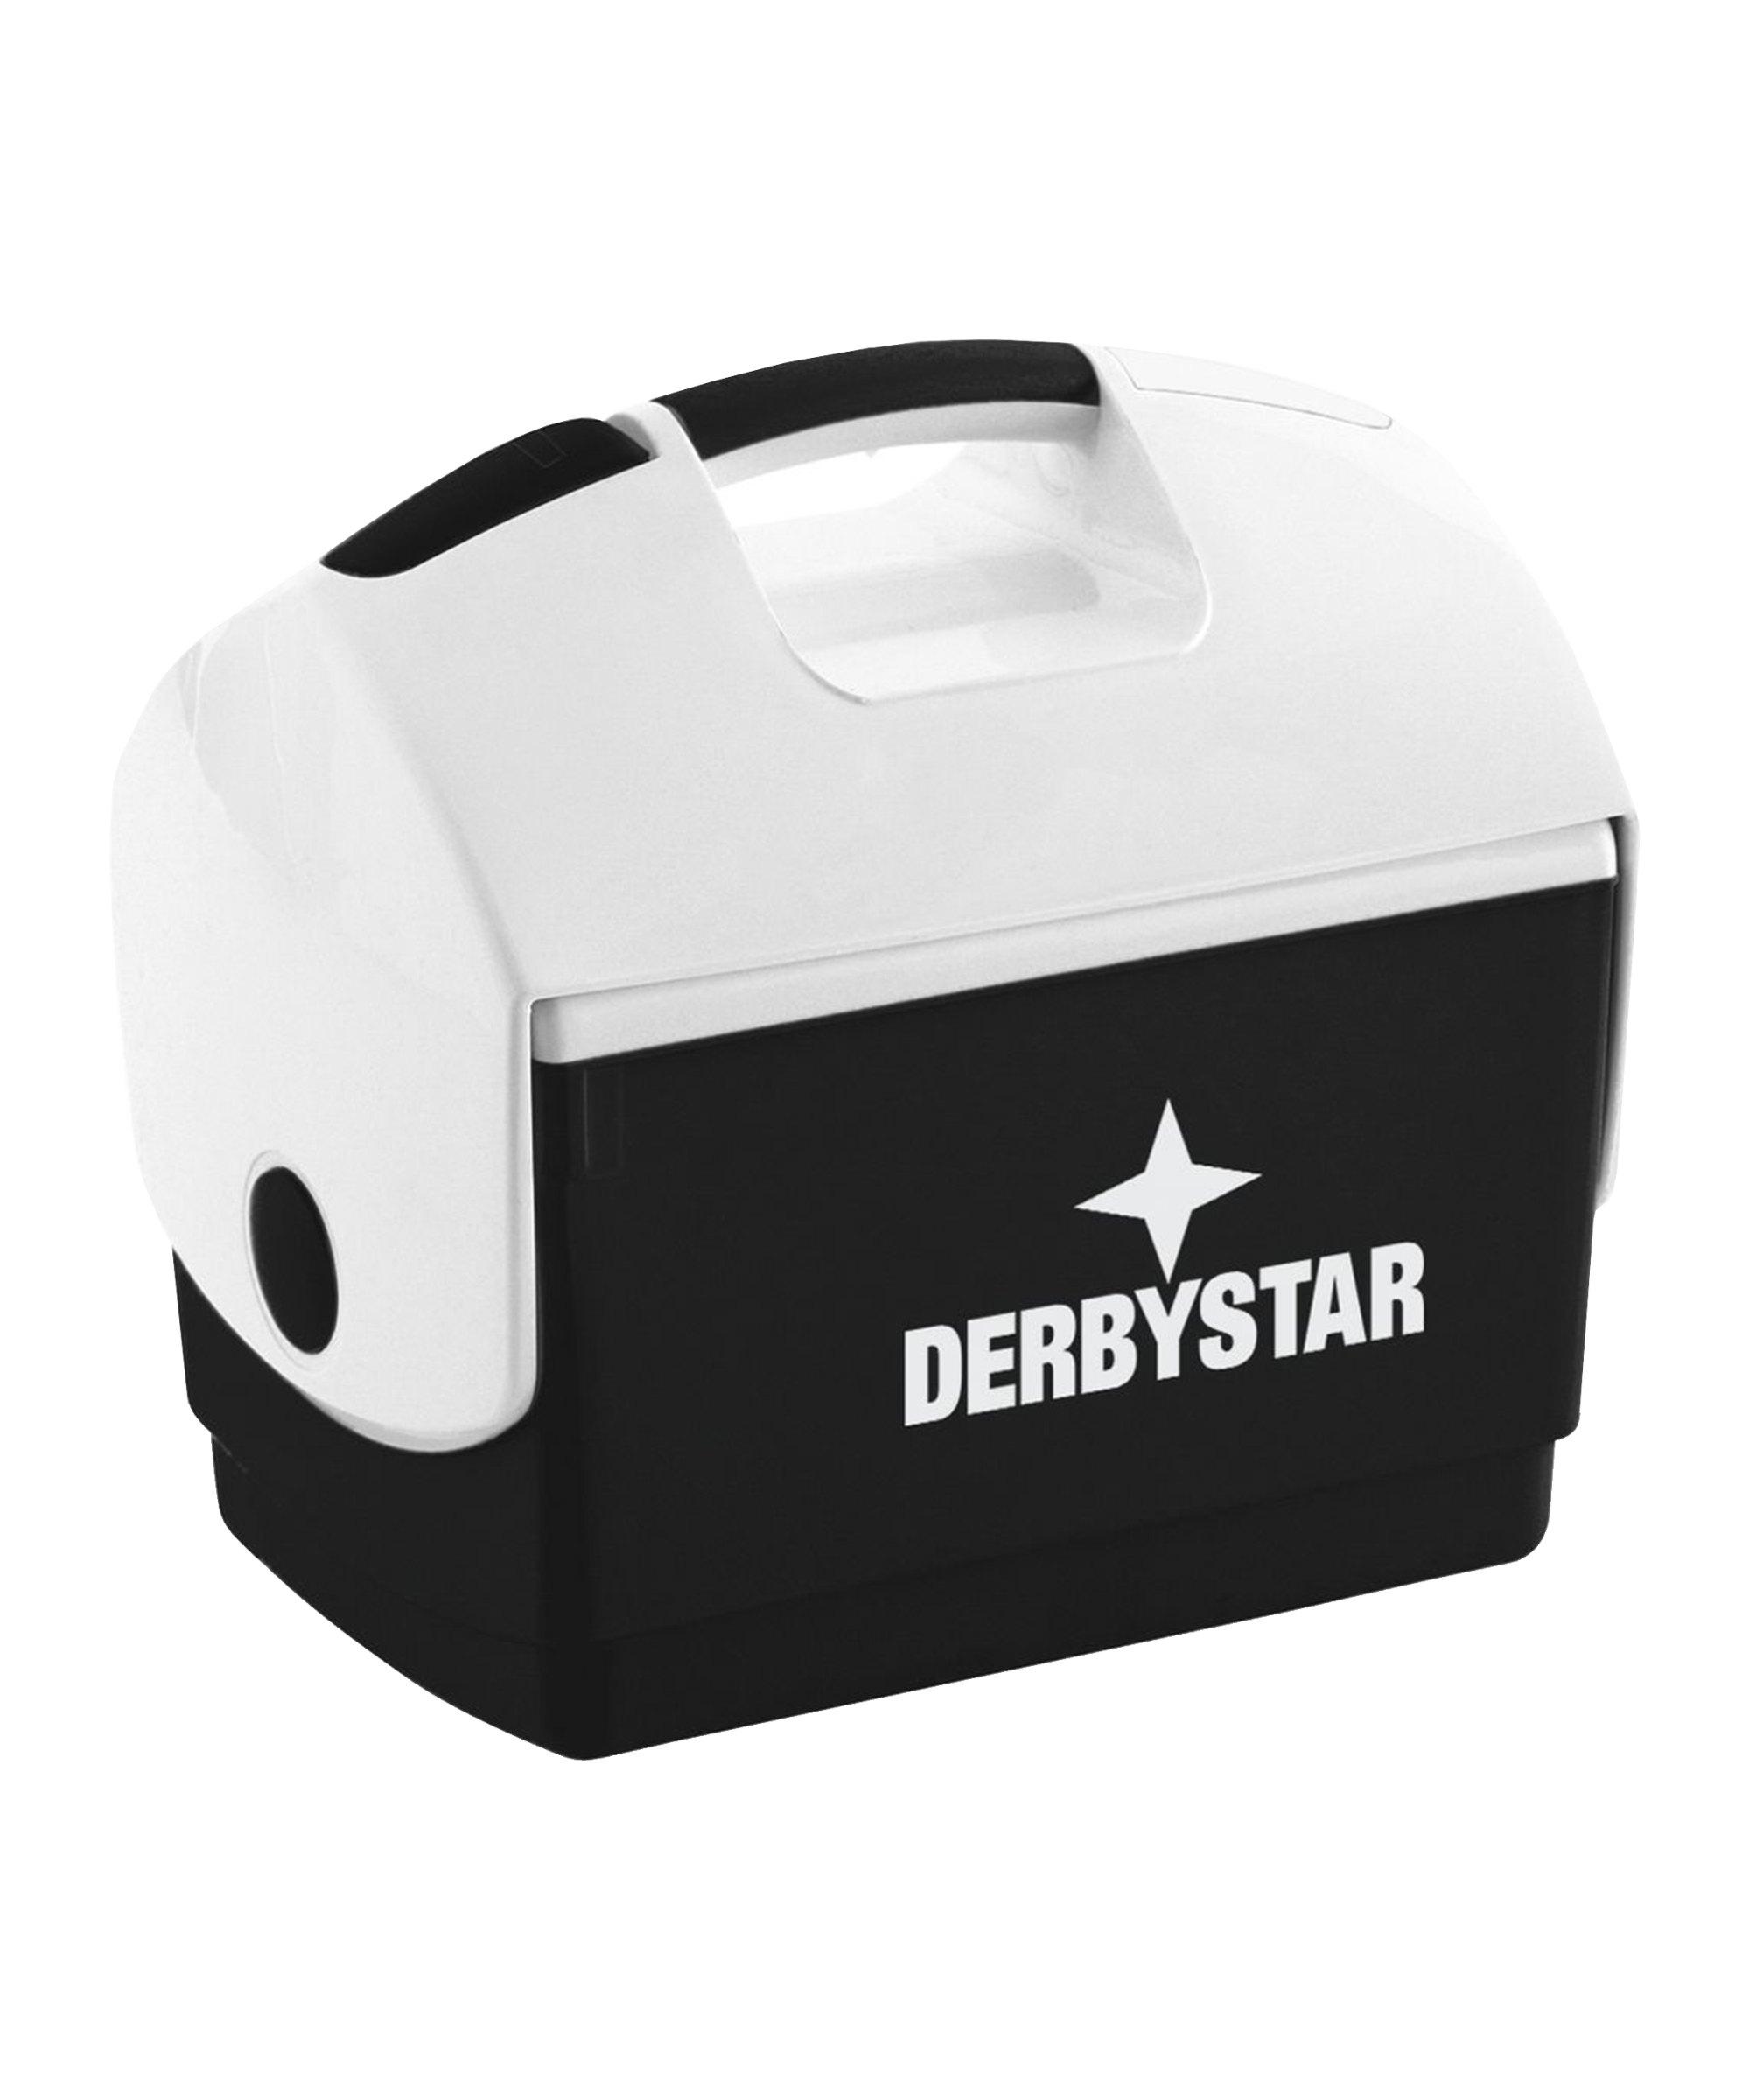 Derbystar Kühlbox 35x23x33cm Schwarz F120 - schwarz